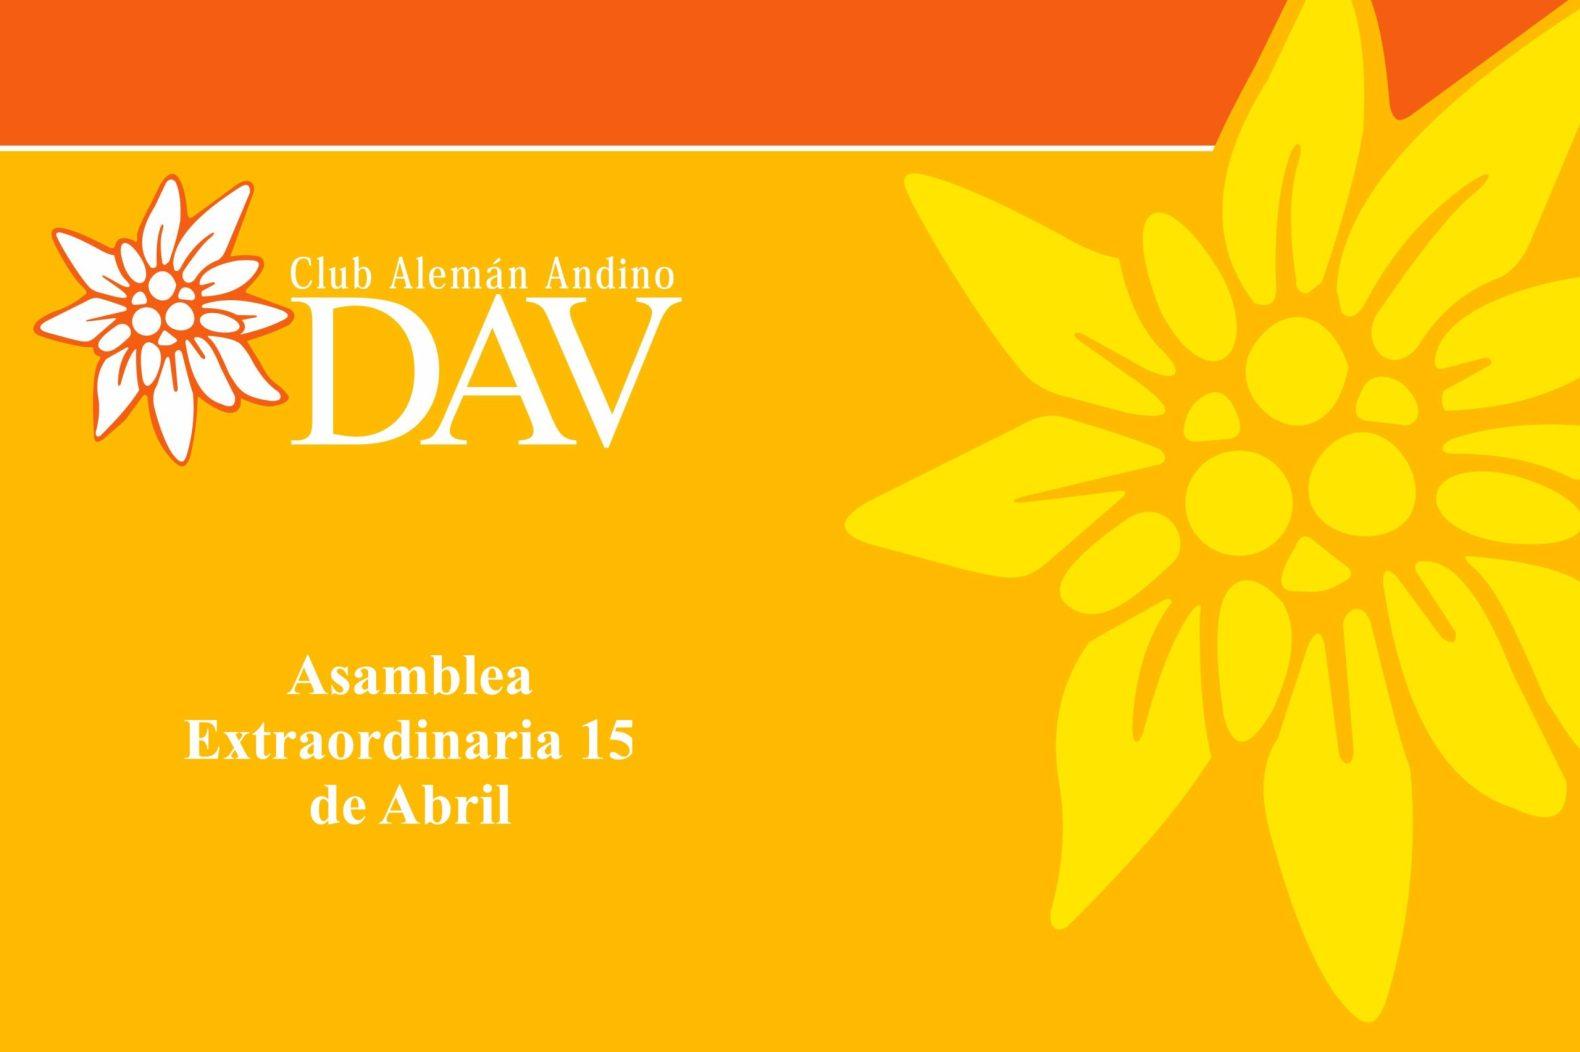 Asamblea Extraordinaria 15 de Abril de 2021